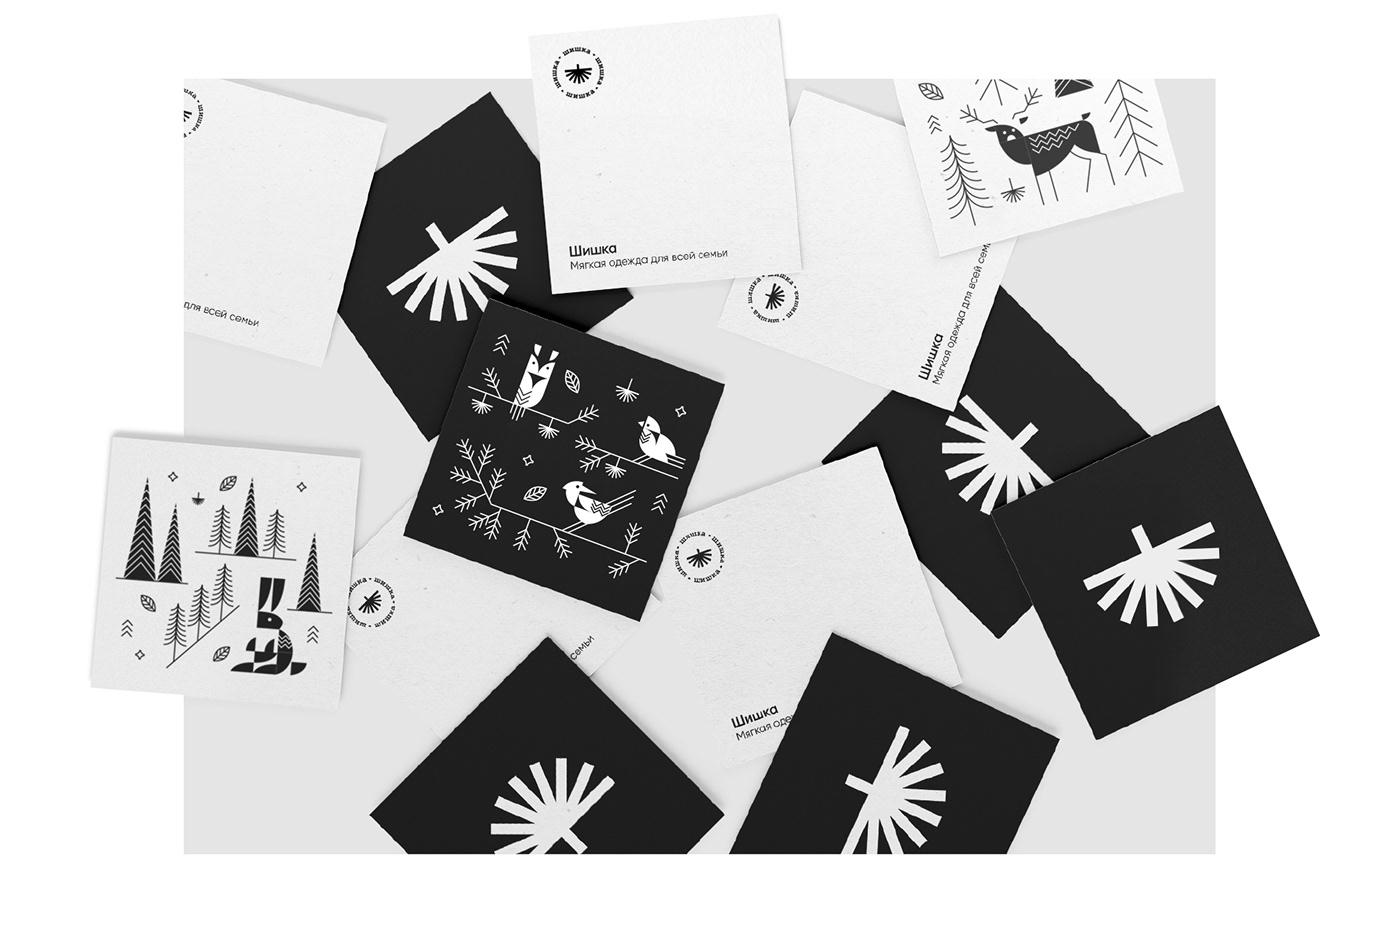 animals brand cone family forest identity logo Nature taiga wear